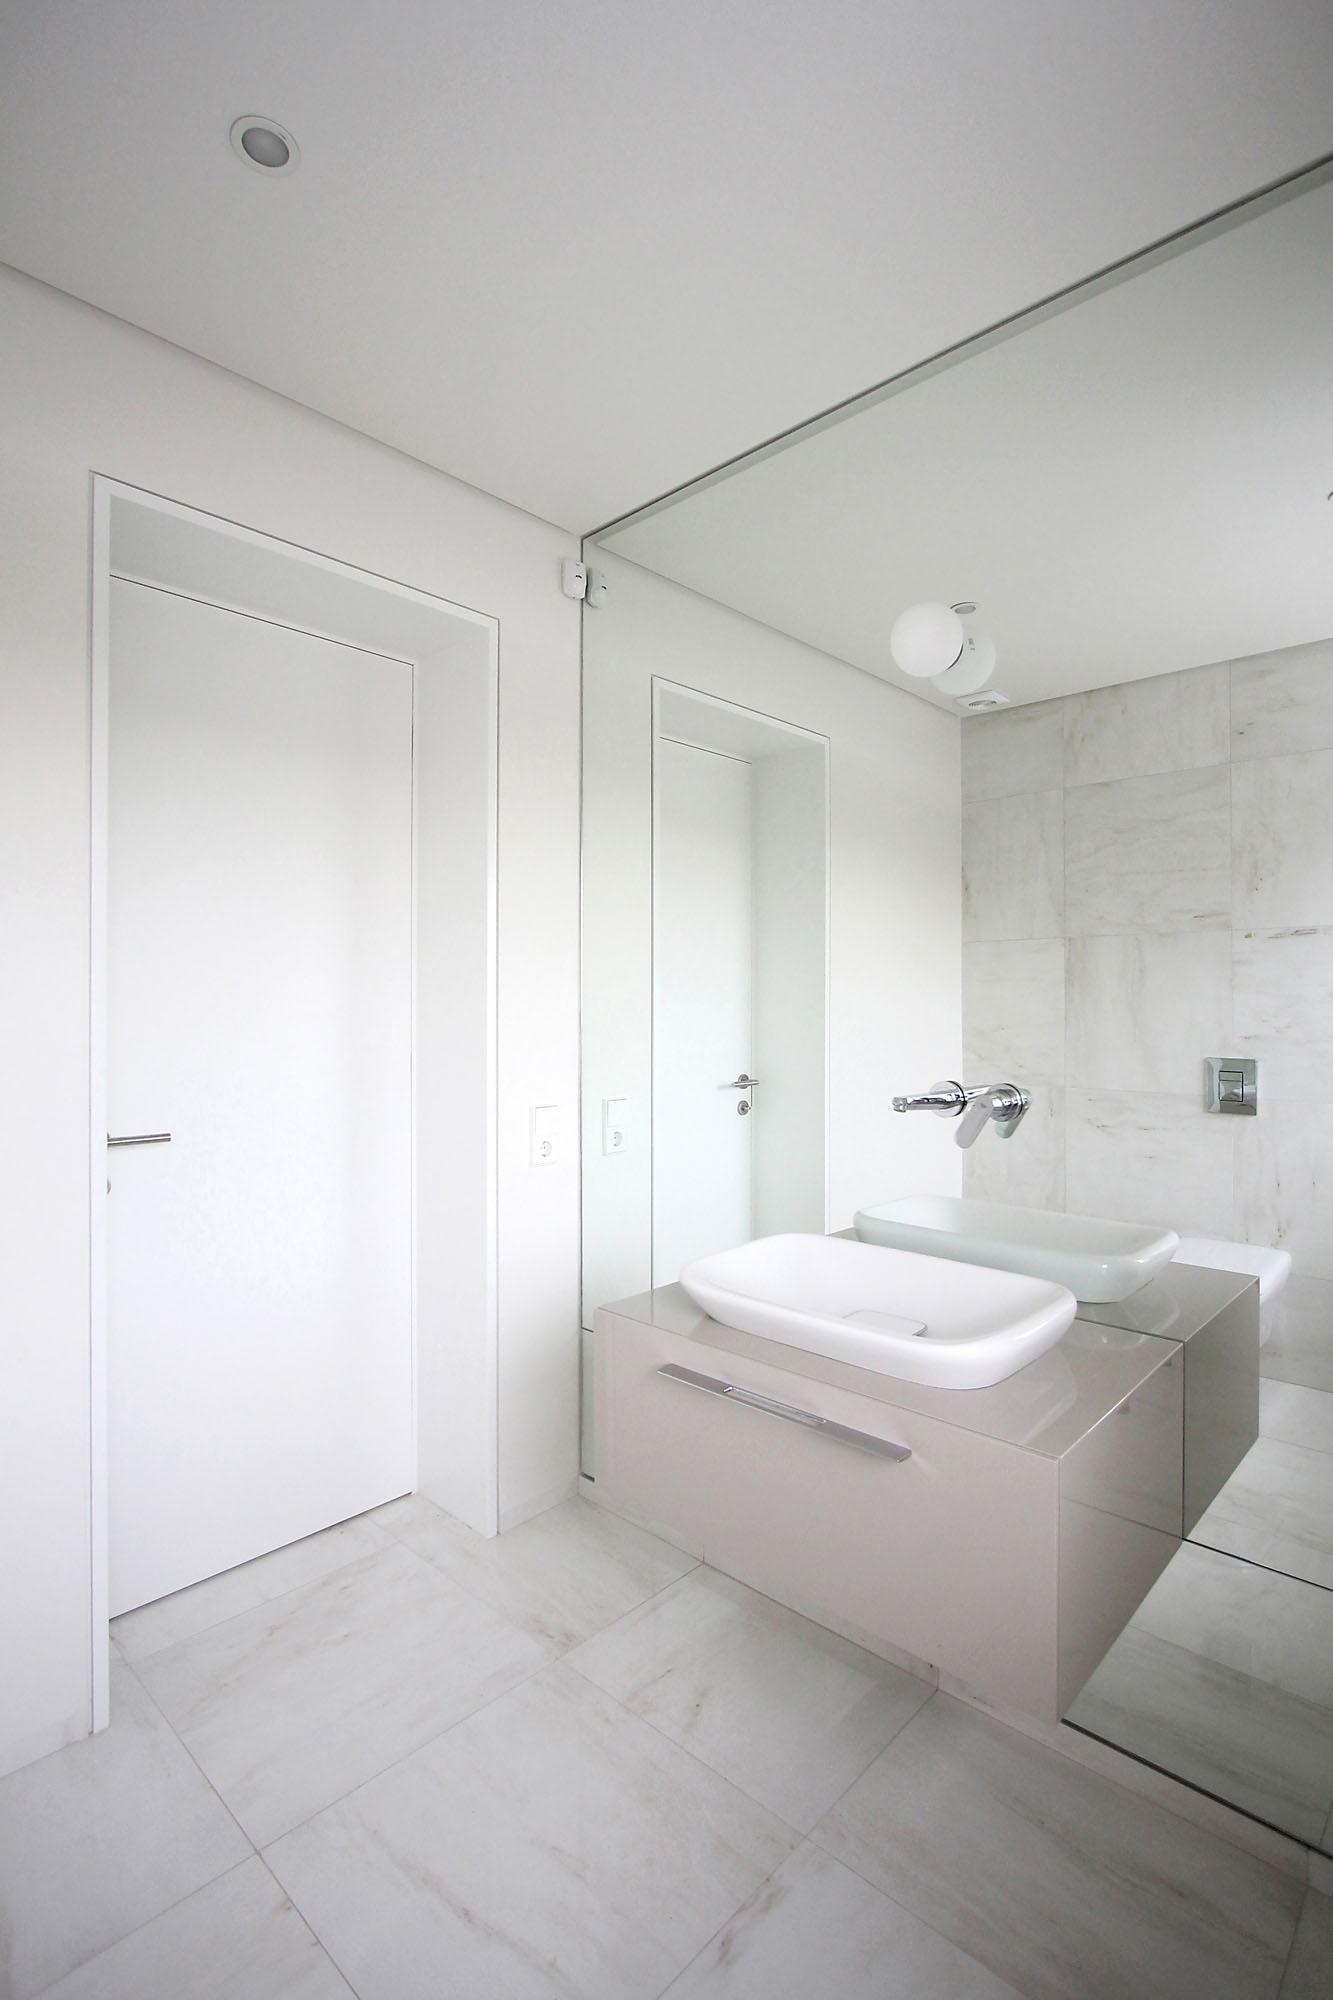 Minimal Style and White Colour Theme of House 02 by Ramunas Manikas-17